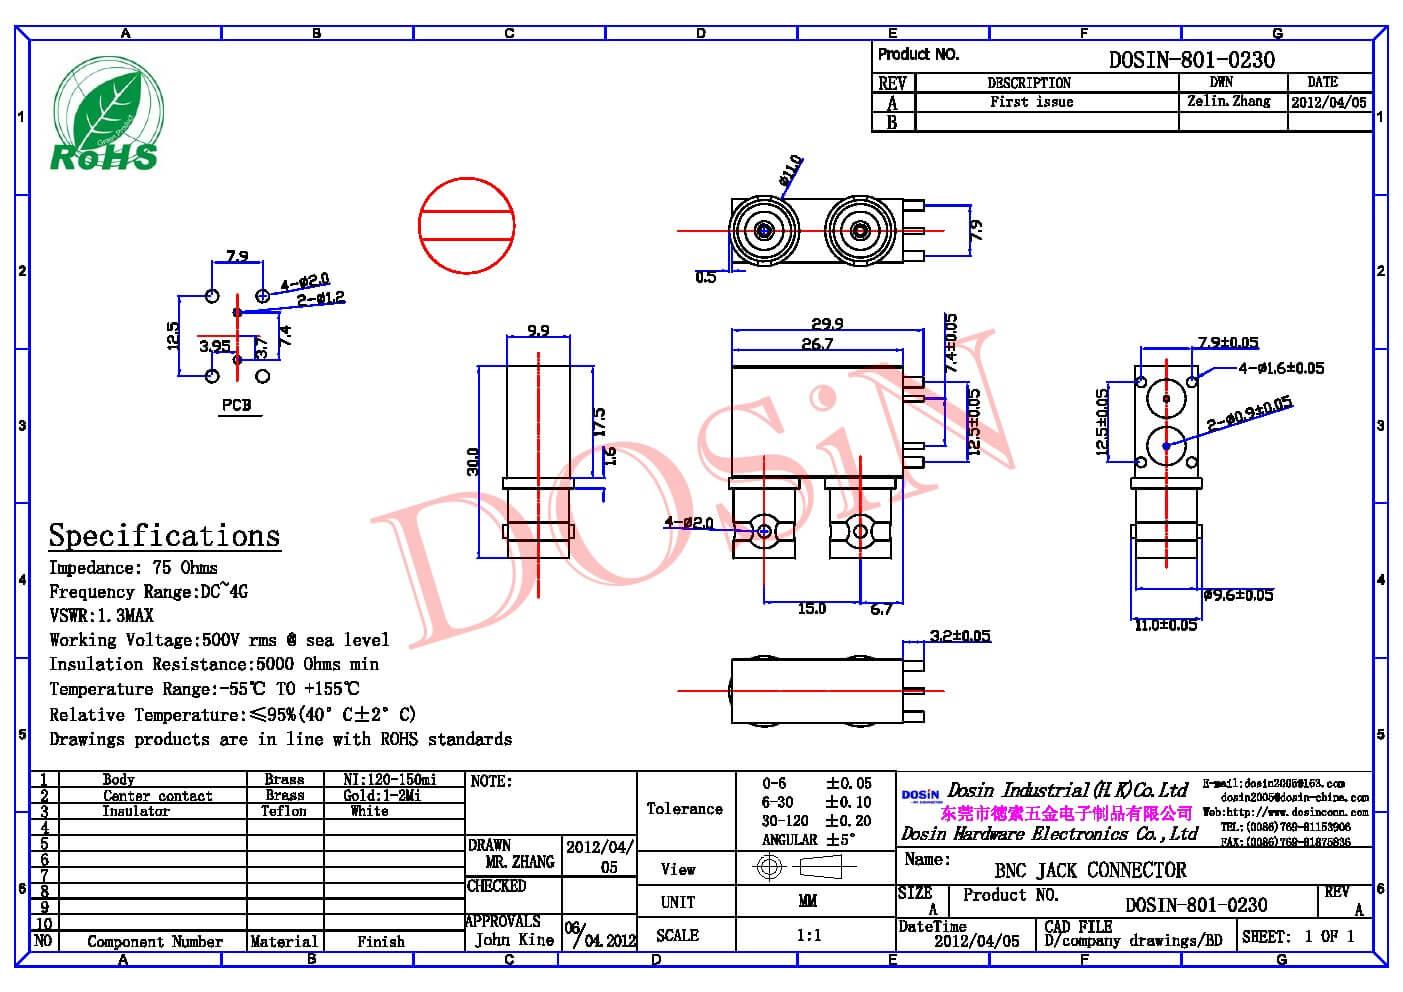 BNC座子PCB母头弯式连接器前锁穿墙插板3.3mm镀镍